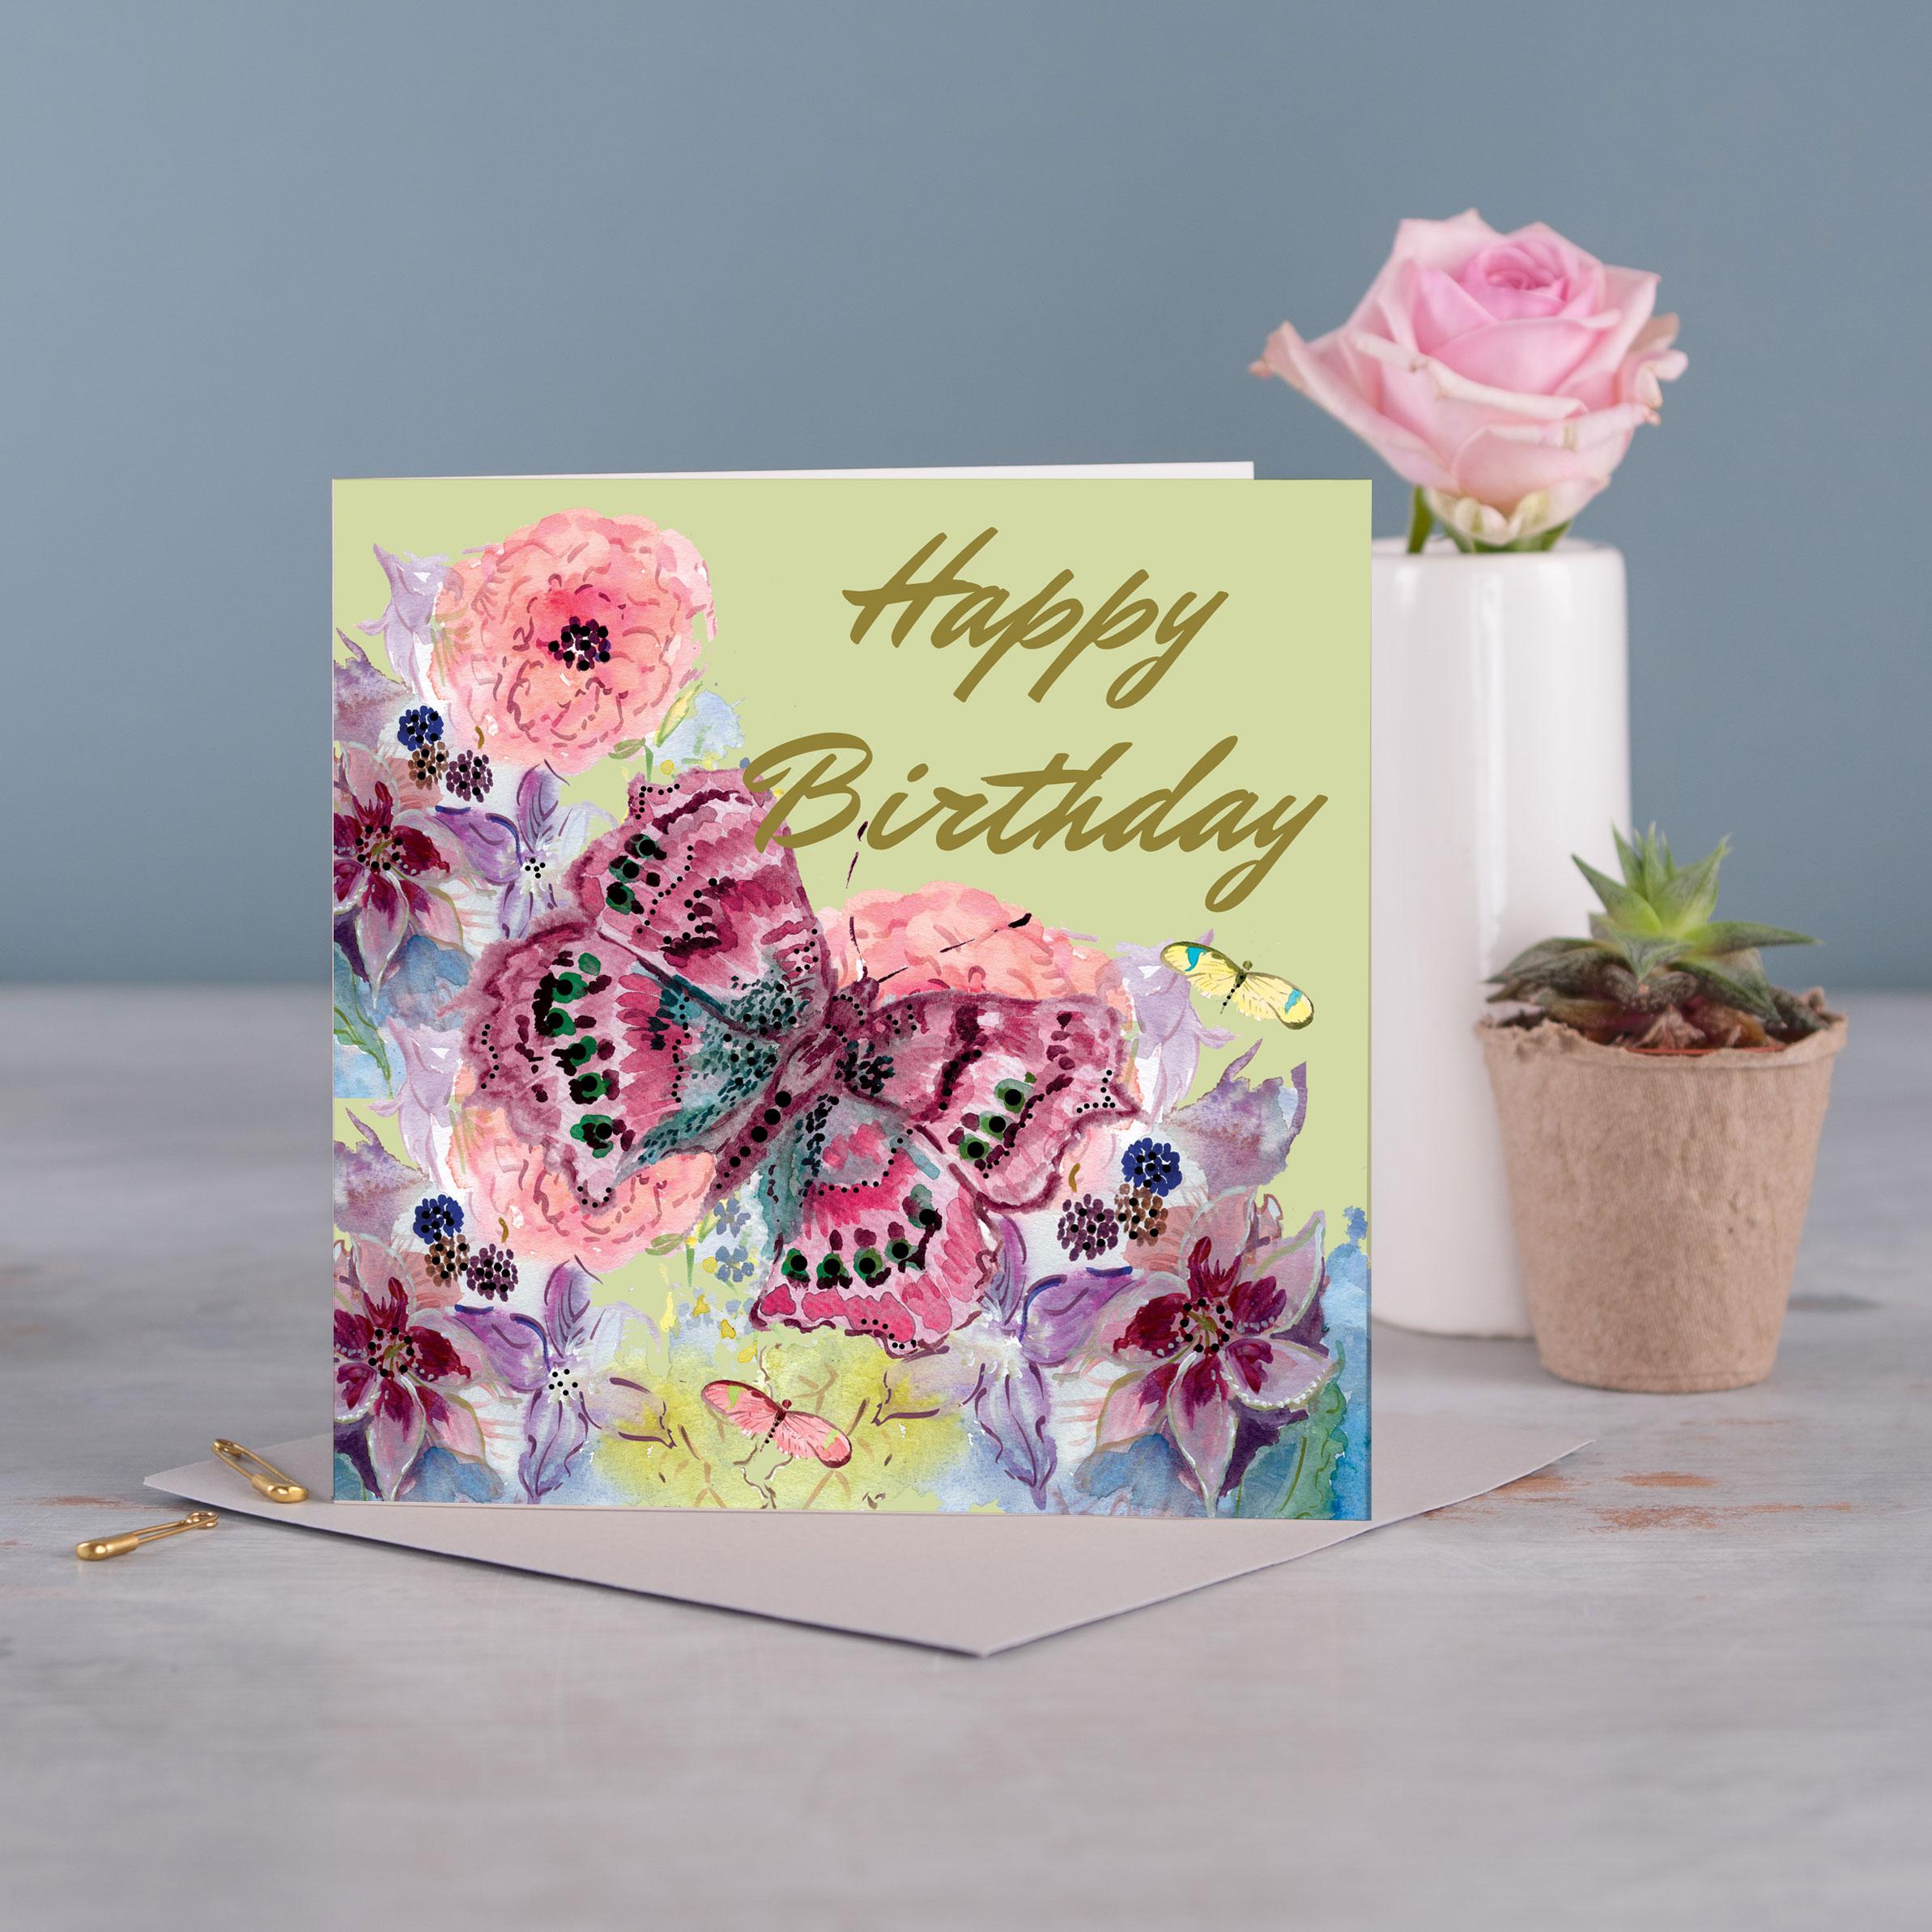 Fanciful Greetings Card